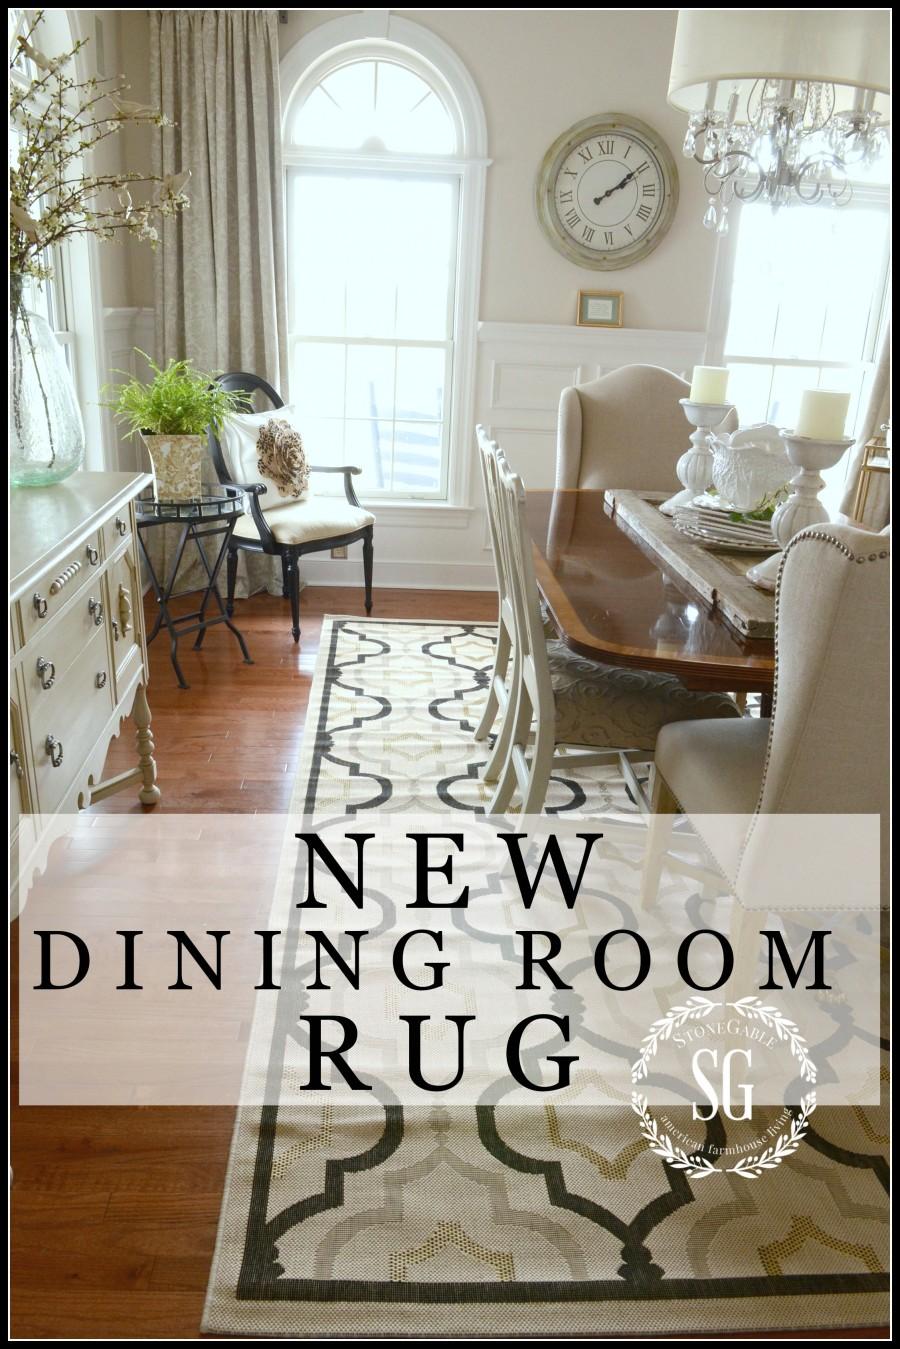 NEW DINING ROOM RUG-changes and updates-stonegableblog.com